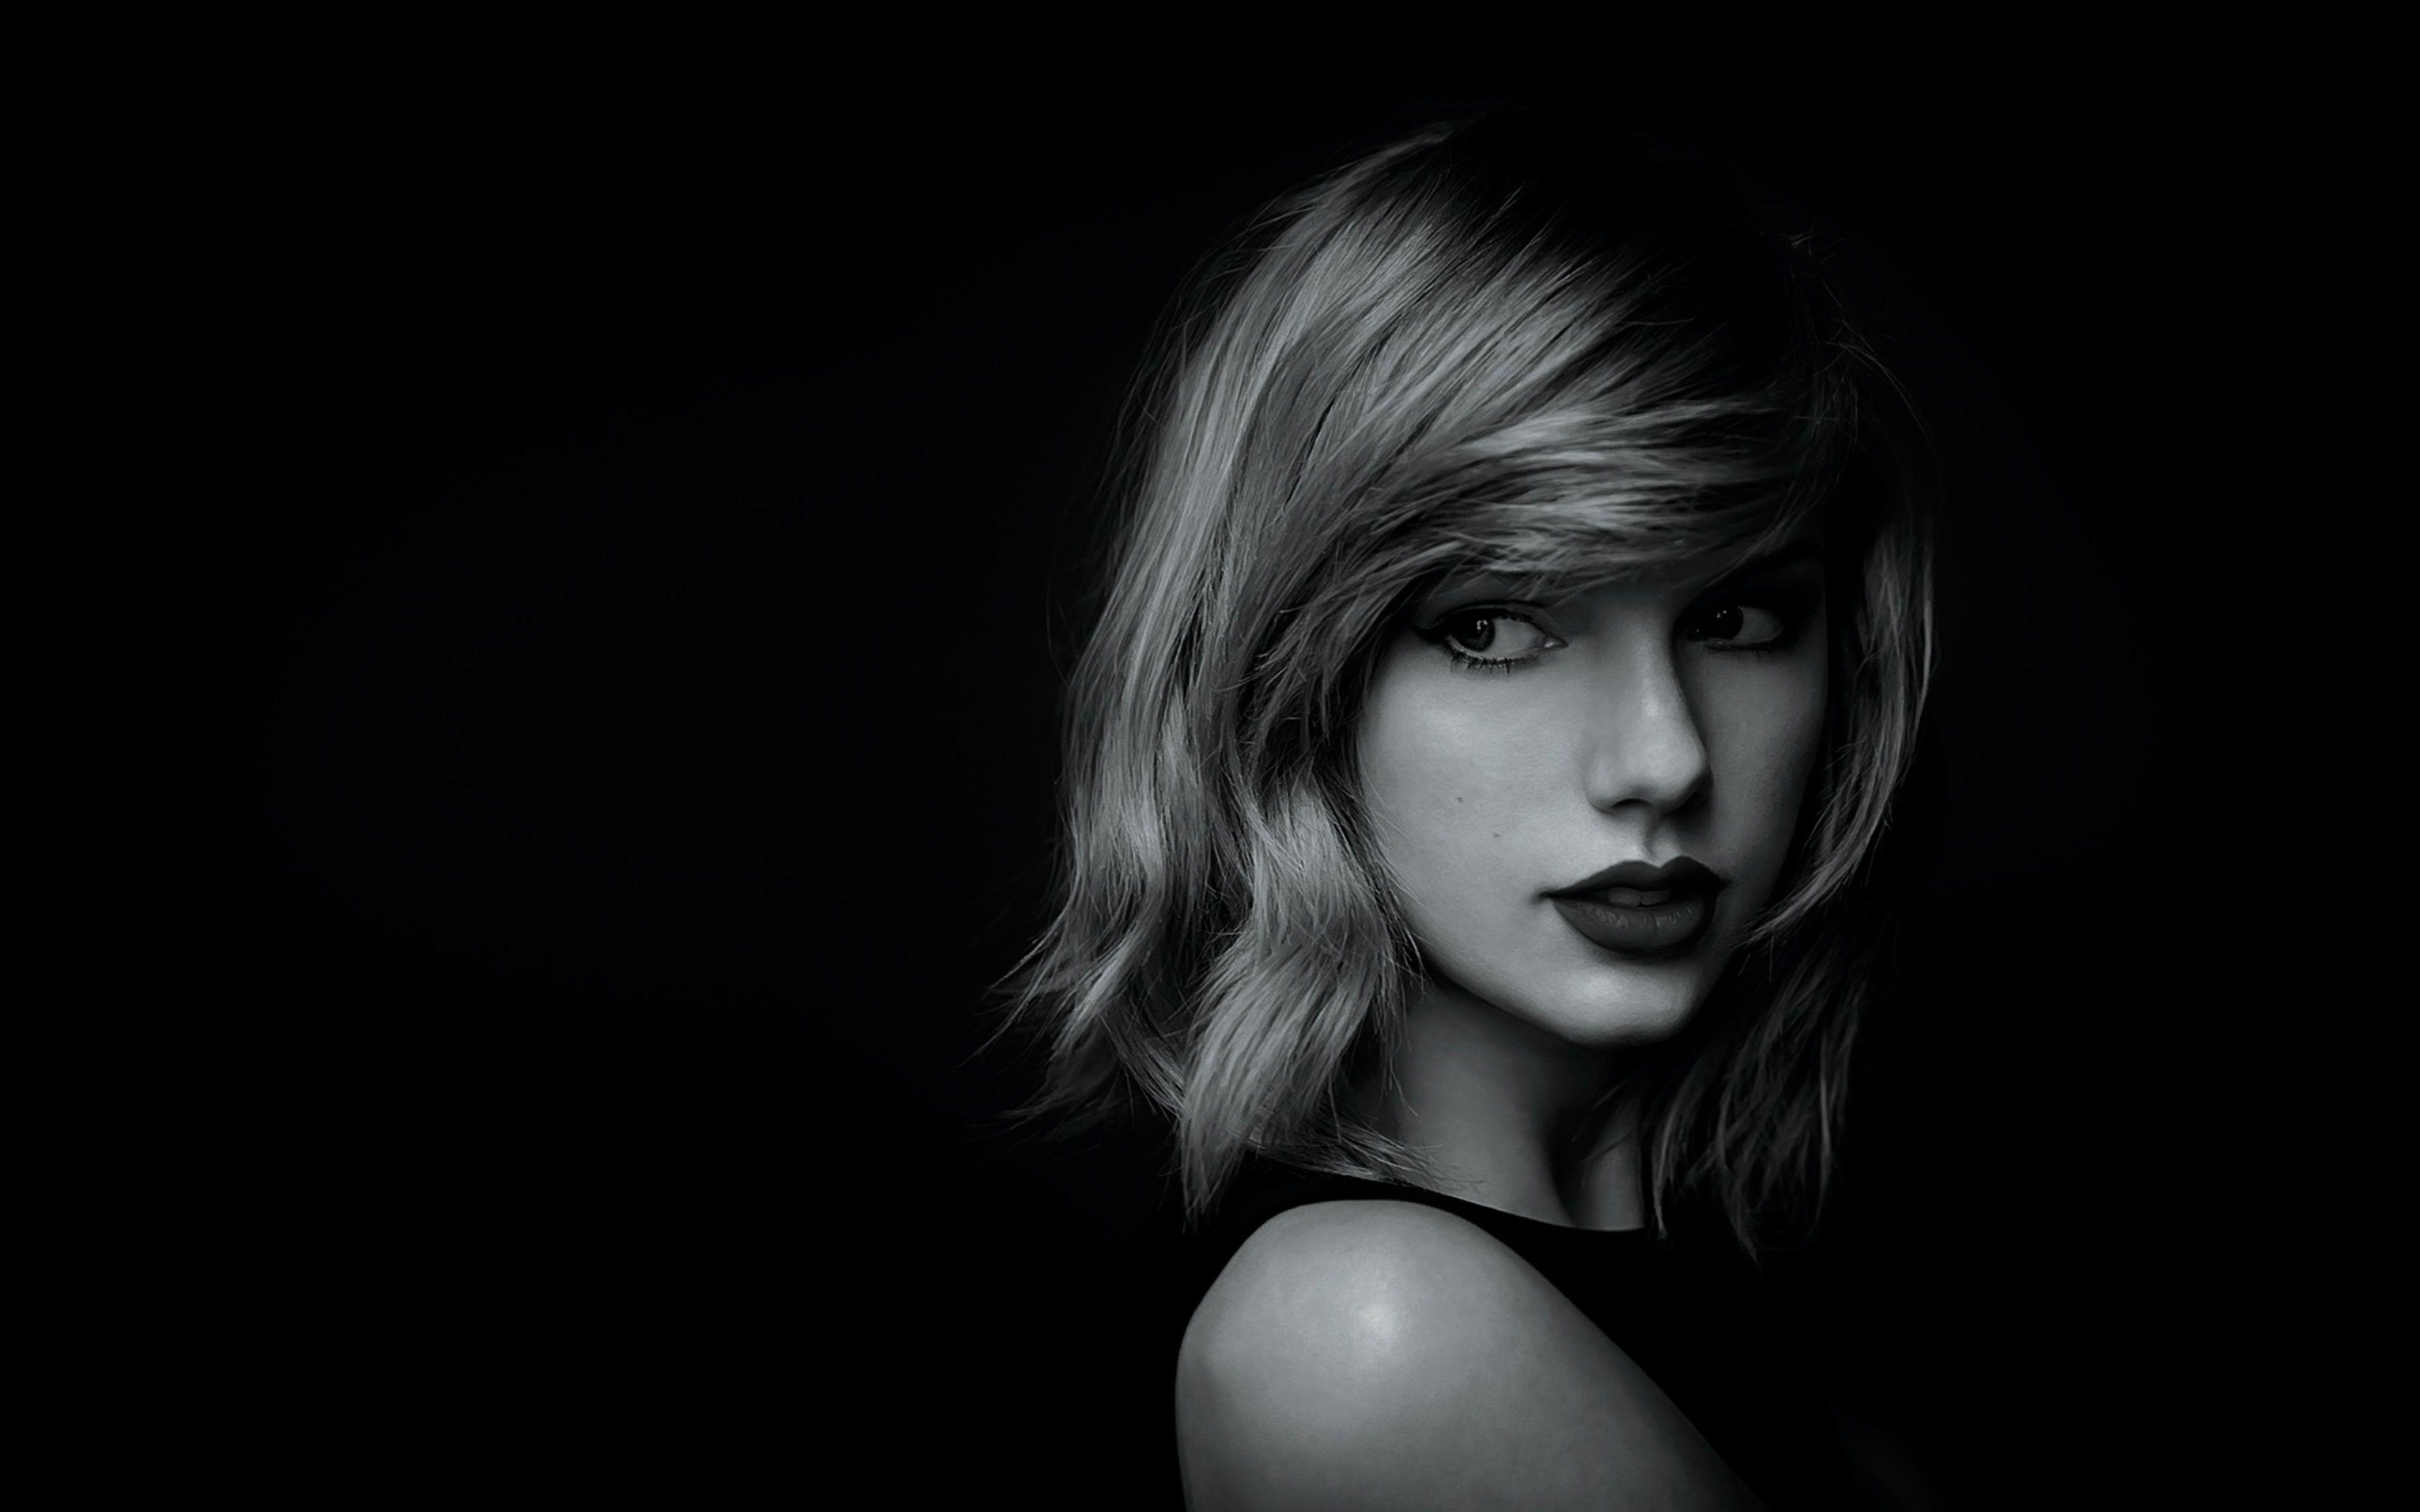 3840x2400 Taylor Swift 4k New Wallpaper In Hd Taylor Swift Wallpaper Taylor Swift Swift Images